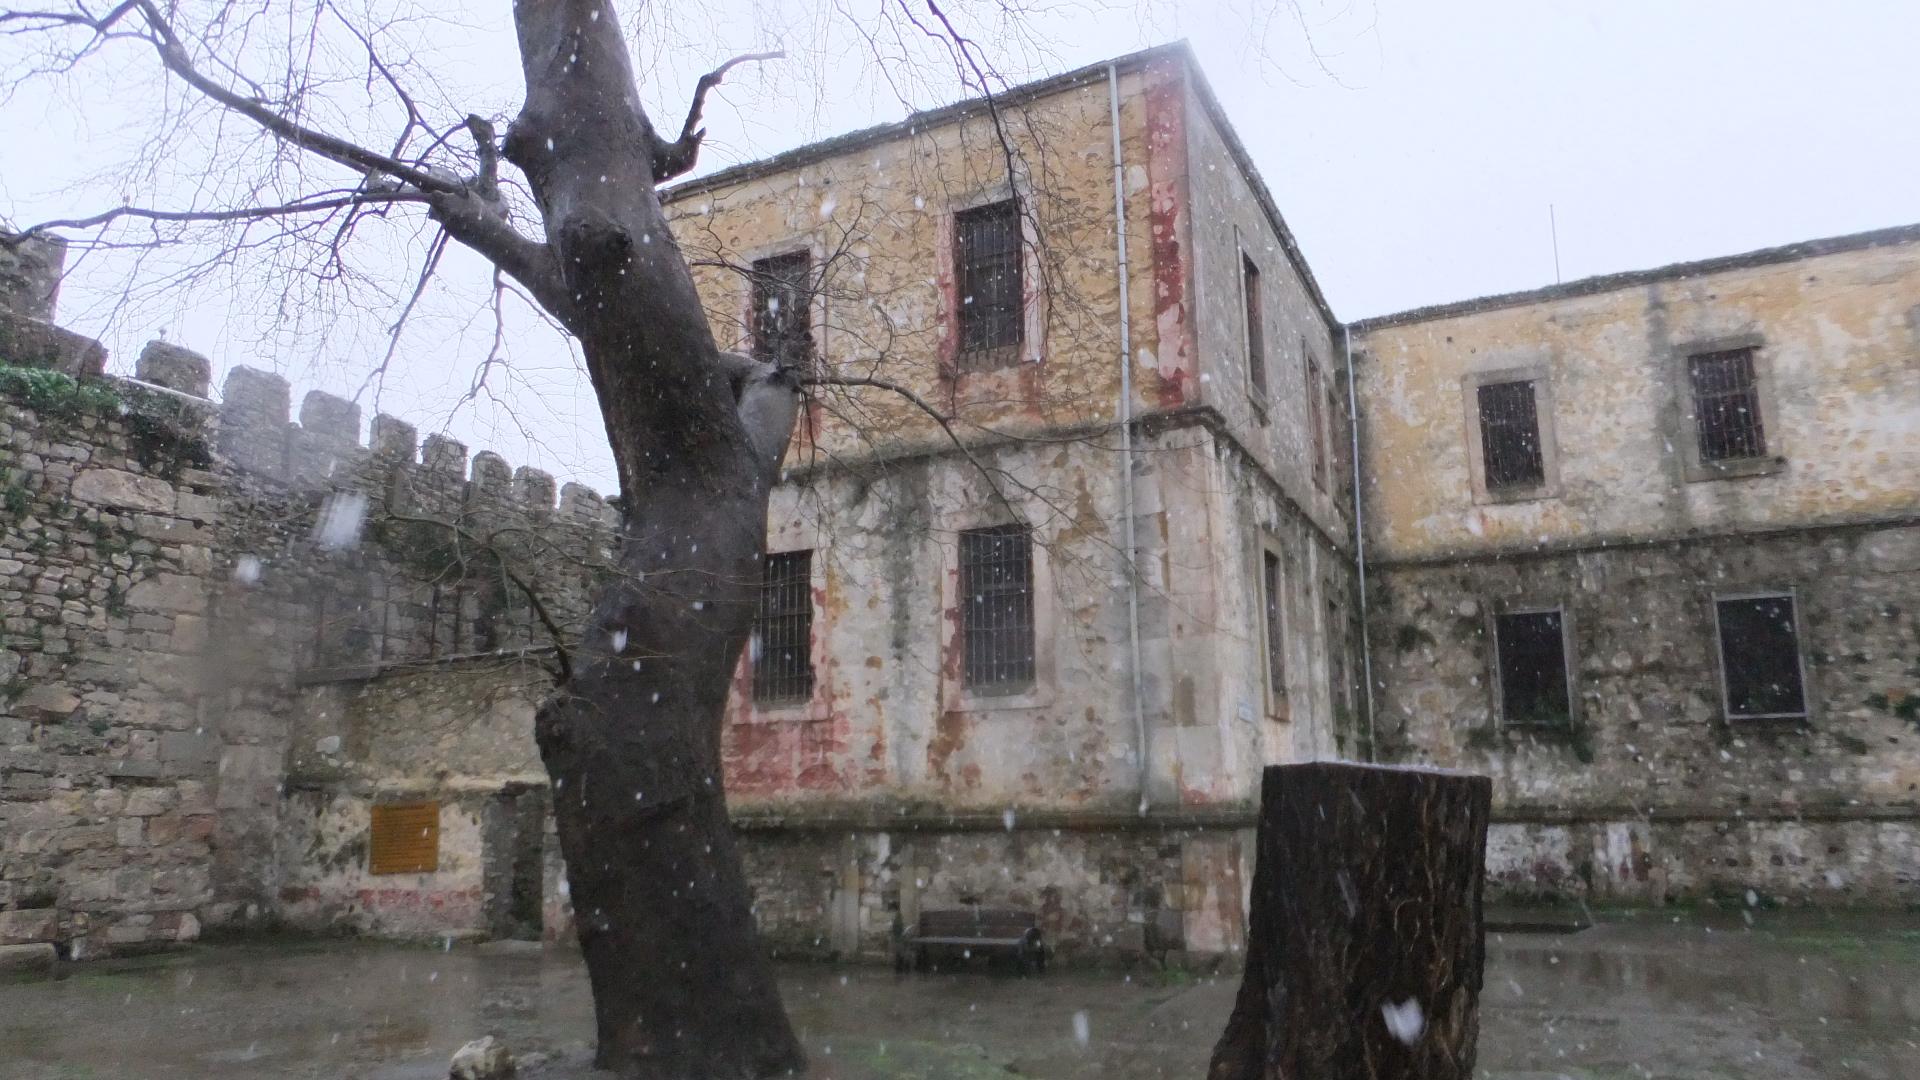 Sinop Fortress Prison - Wikipedia